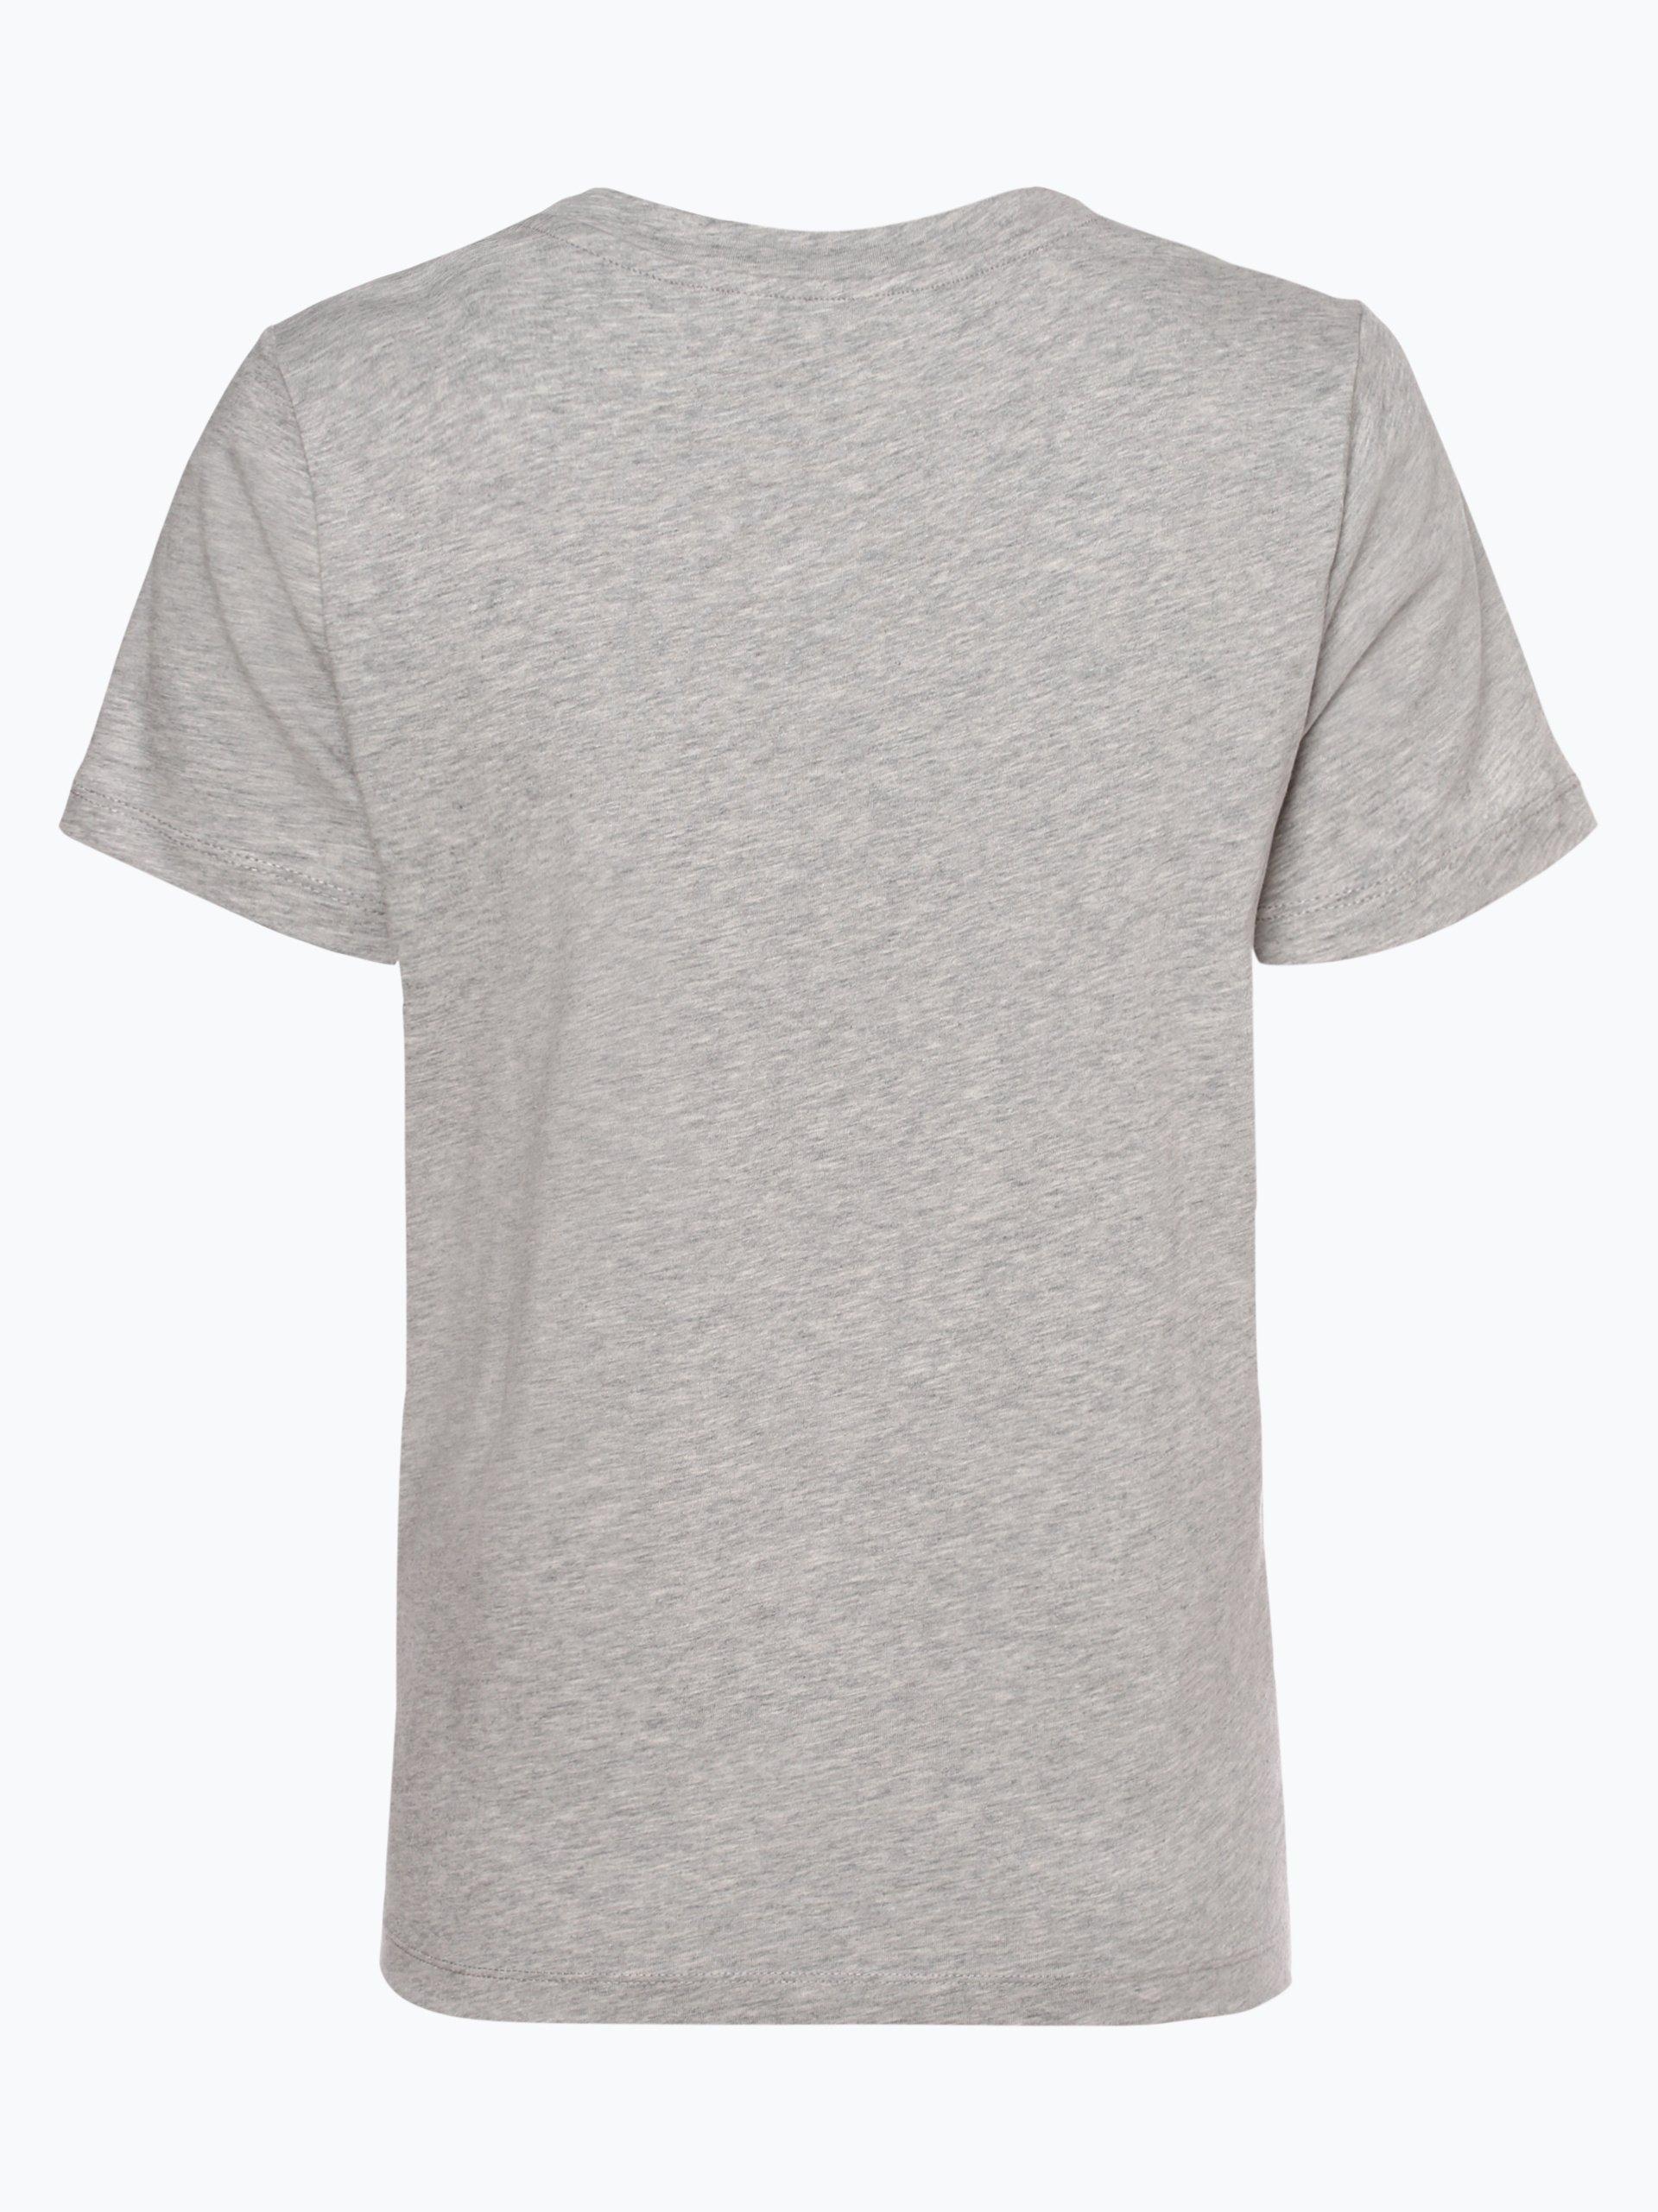 tommy hilfiger damen t shirt grau bedruckt online kaufen. Black Bedroom Furniture Sets. Home Design Ideas